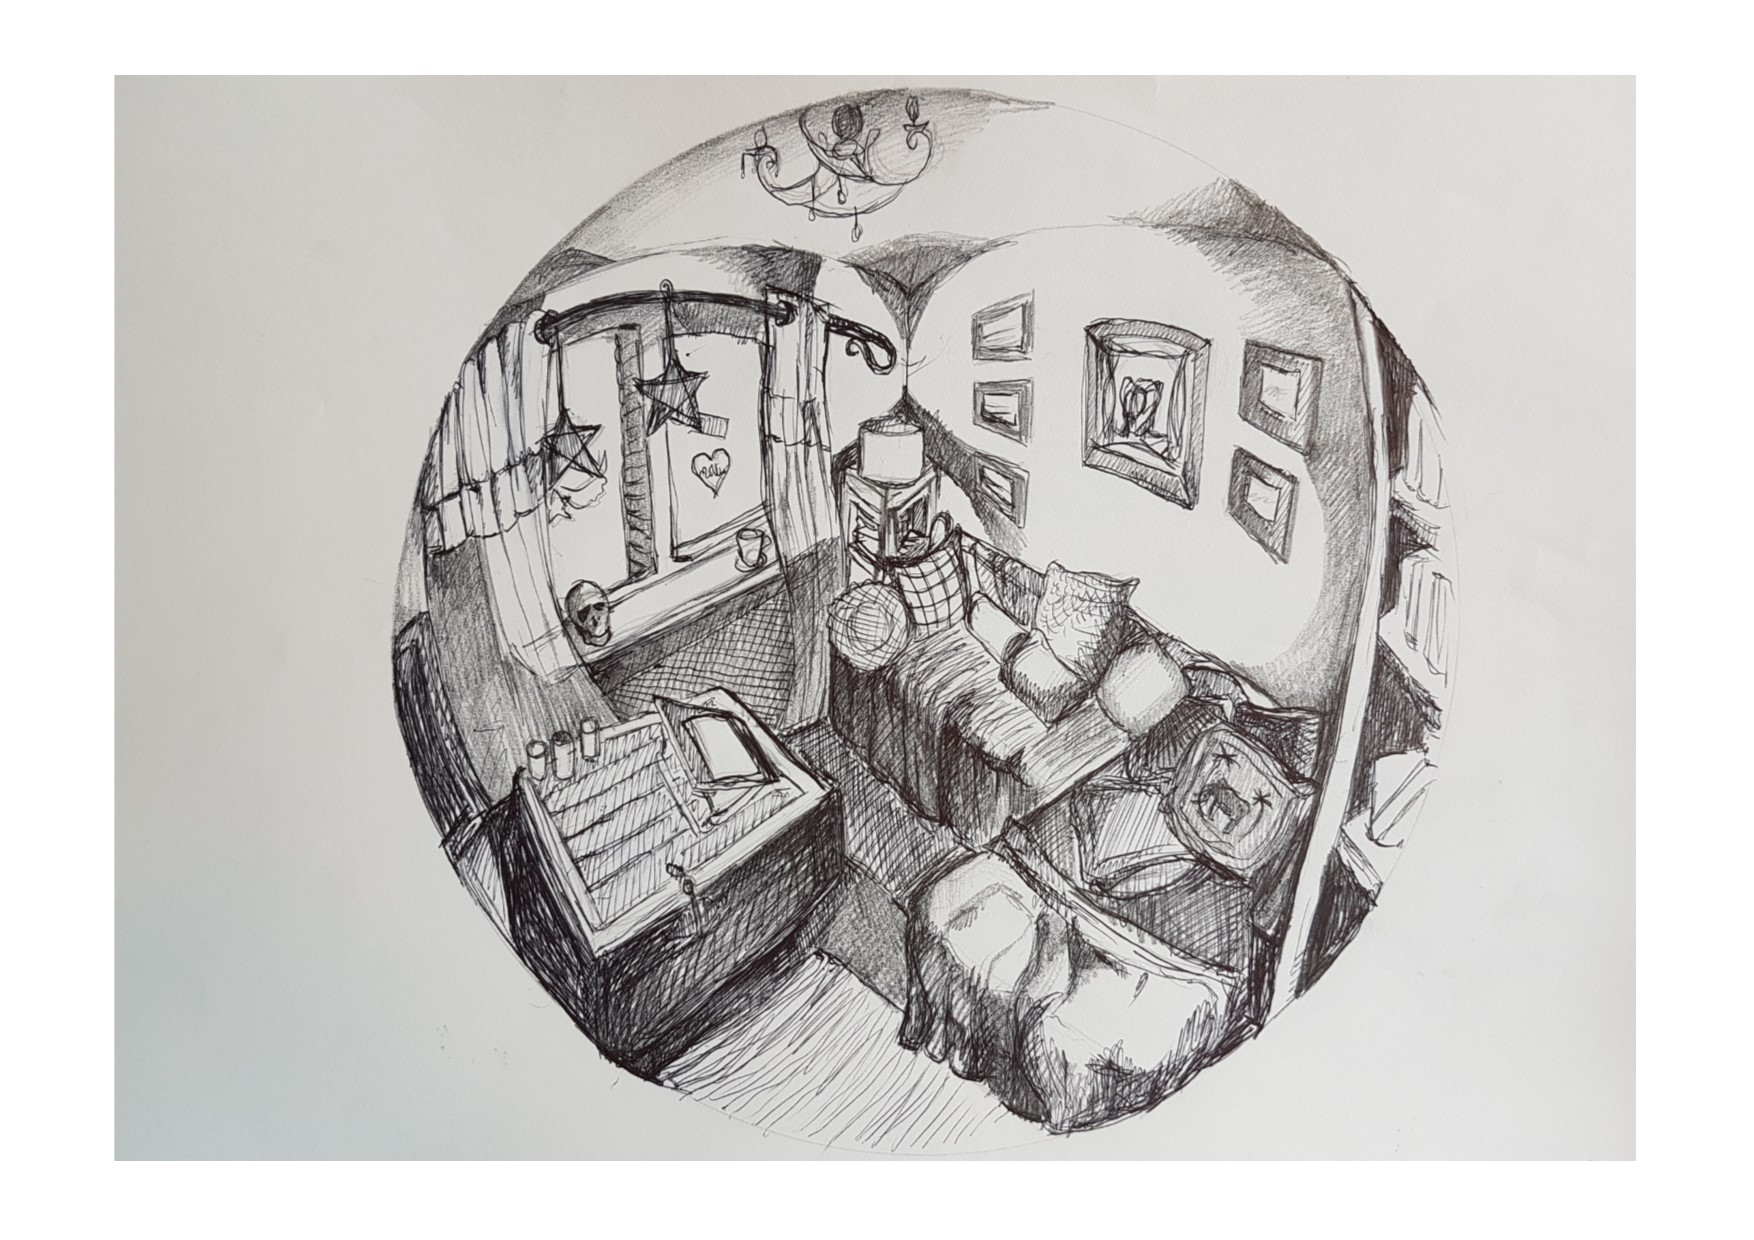 fish eye lens living room sketch